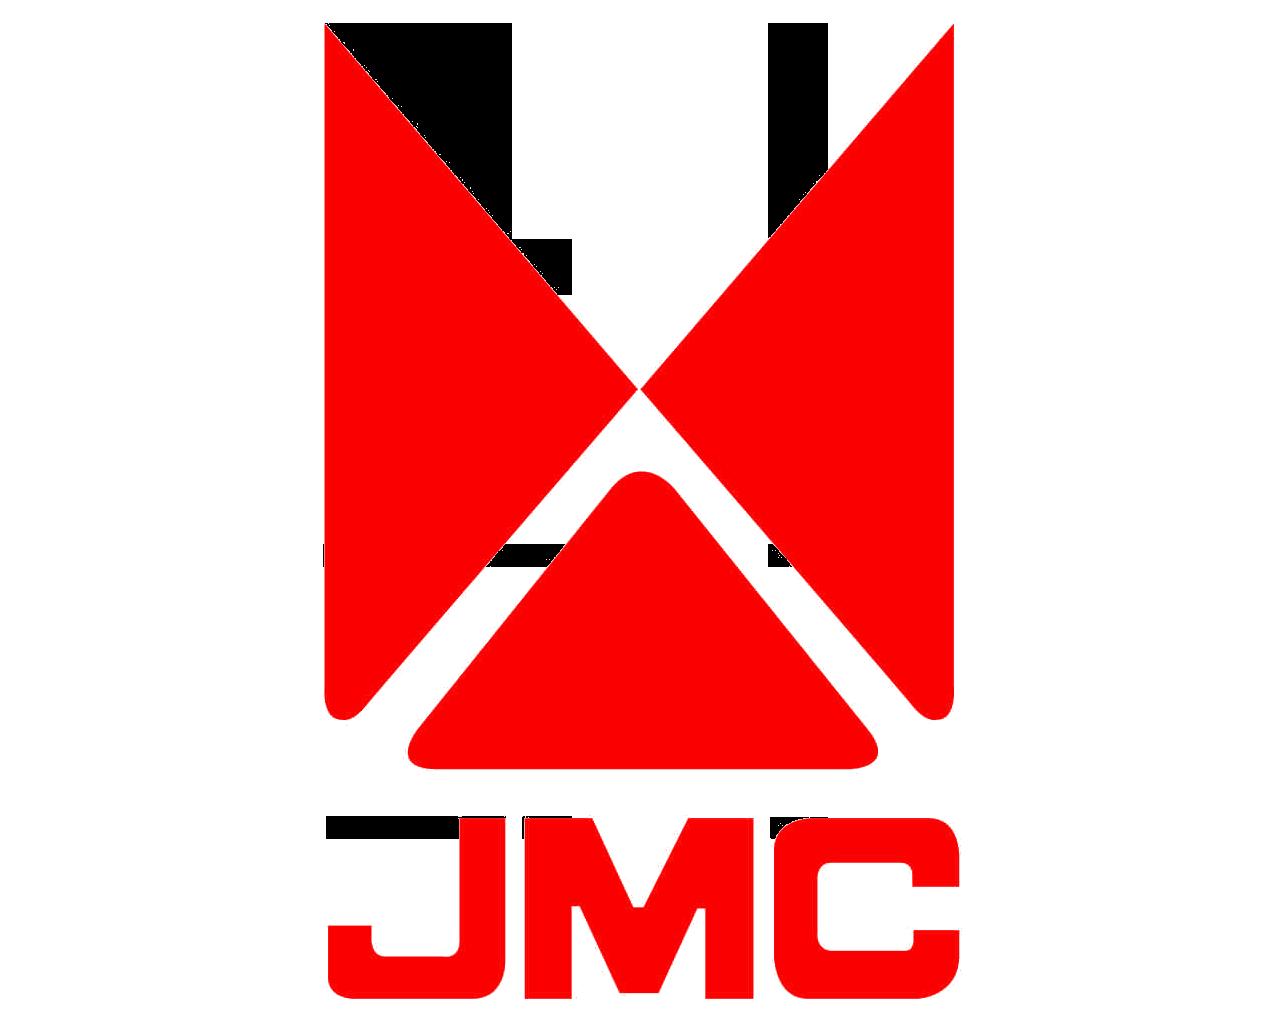 J And M Auto >> Jiangling (JMC) Logo, Png, Information | Carlogos.org